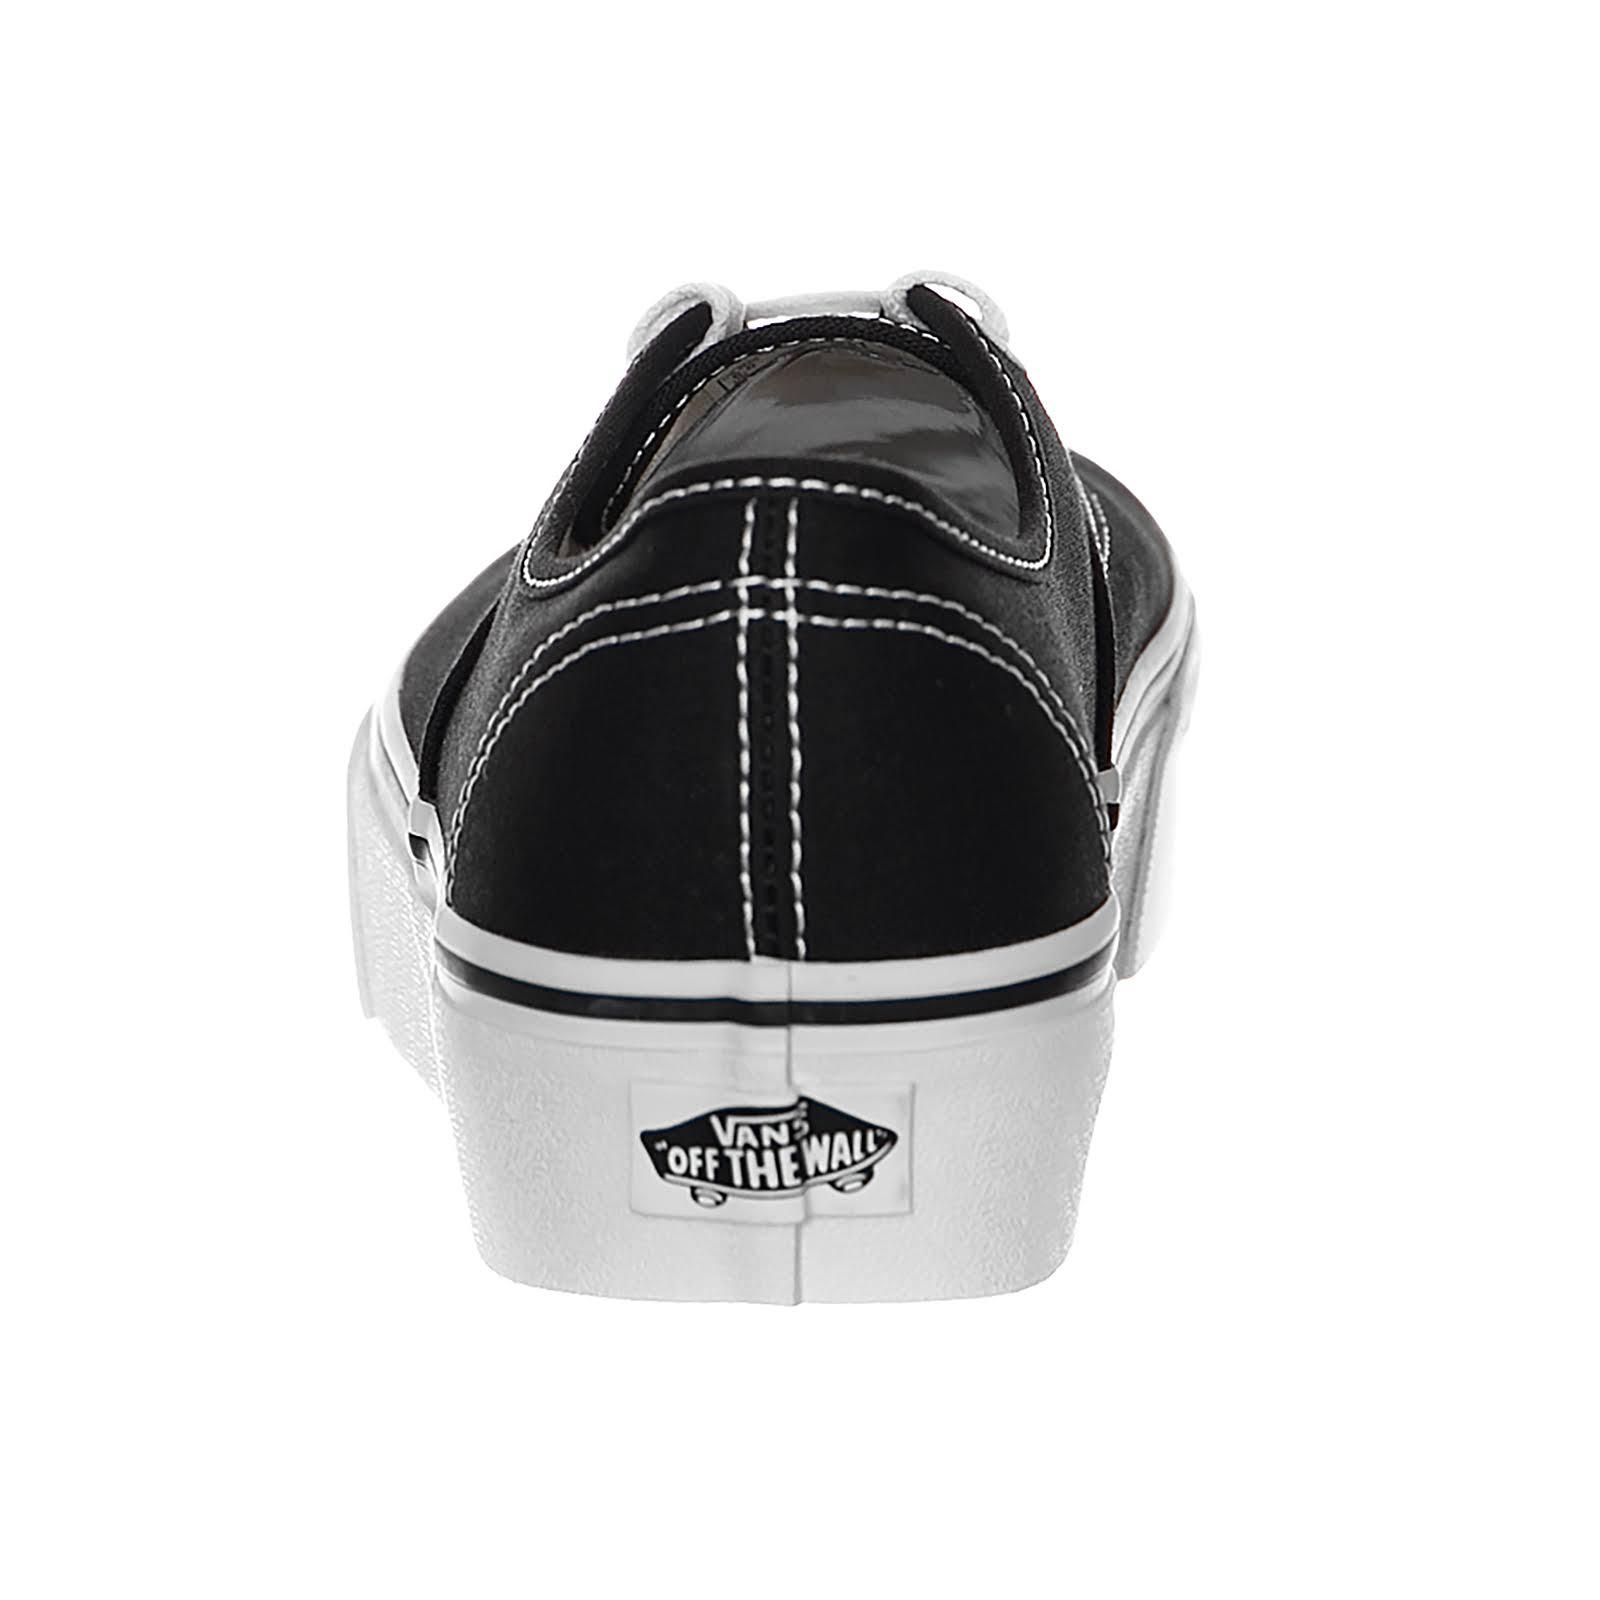 black Nero Sneakers Scarpe Va3av8 Authentic donne Blk Vans Donna Platform Black 8qBRnZnt